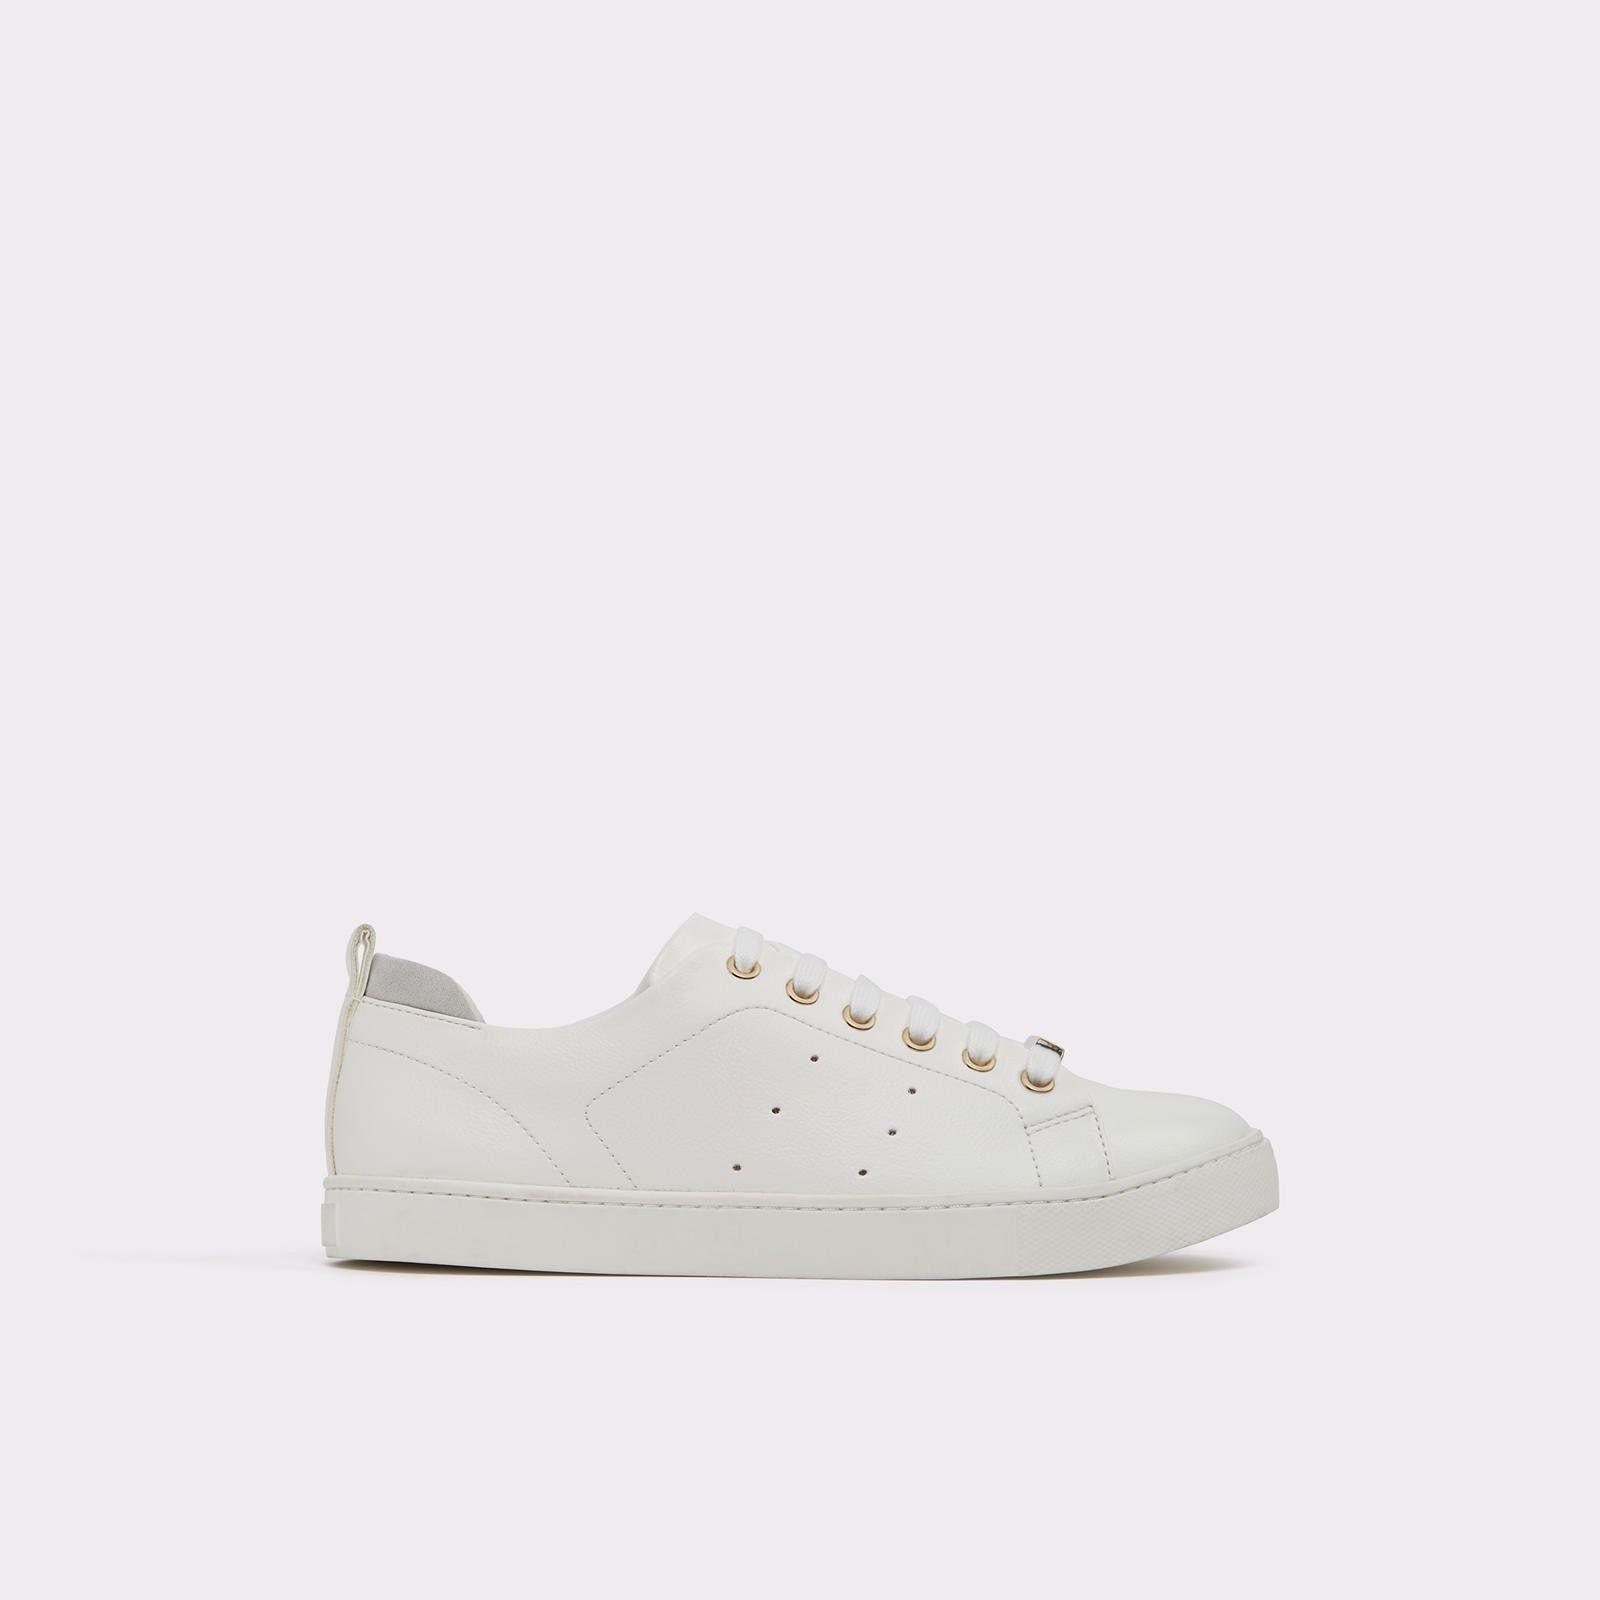 802c20c33ec Merane-N White Women, Athleisure, Women's Sneakers, Aldo Shoes, Adidas Stan